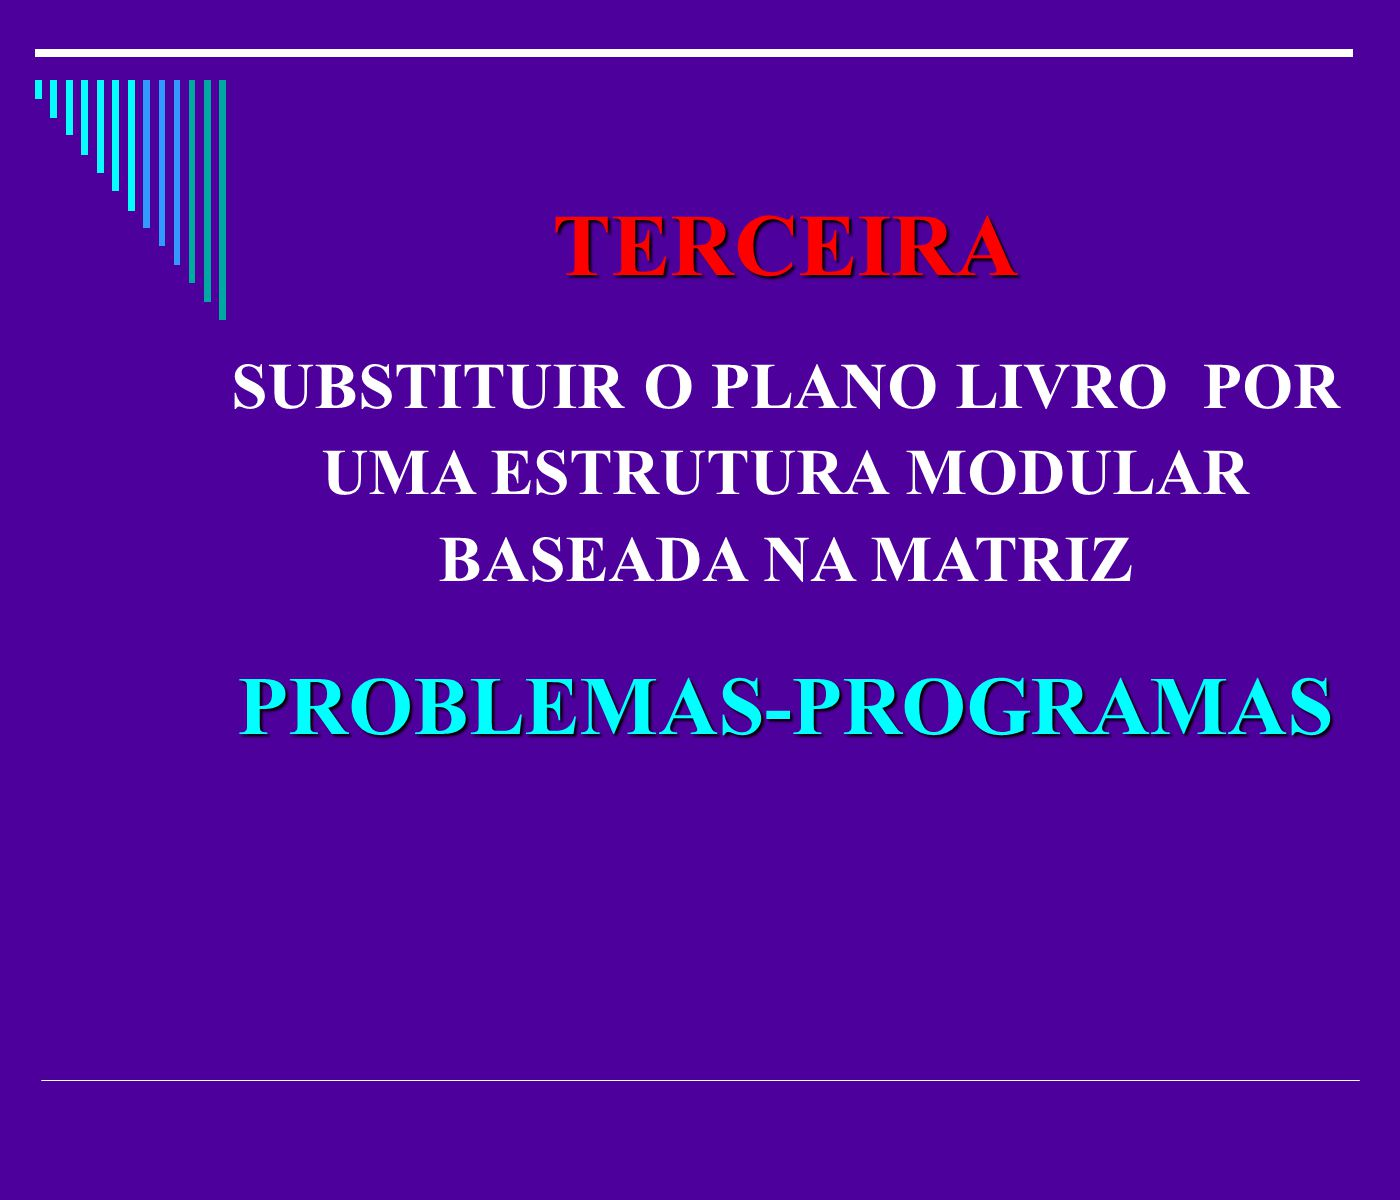 TERCEIRA SUBSTITUIR O PLANO LIVRO POR UMA ESTRUTURA MODULAR BASEADA NA MATRIZPROBLEMAS-PROGRAMAS